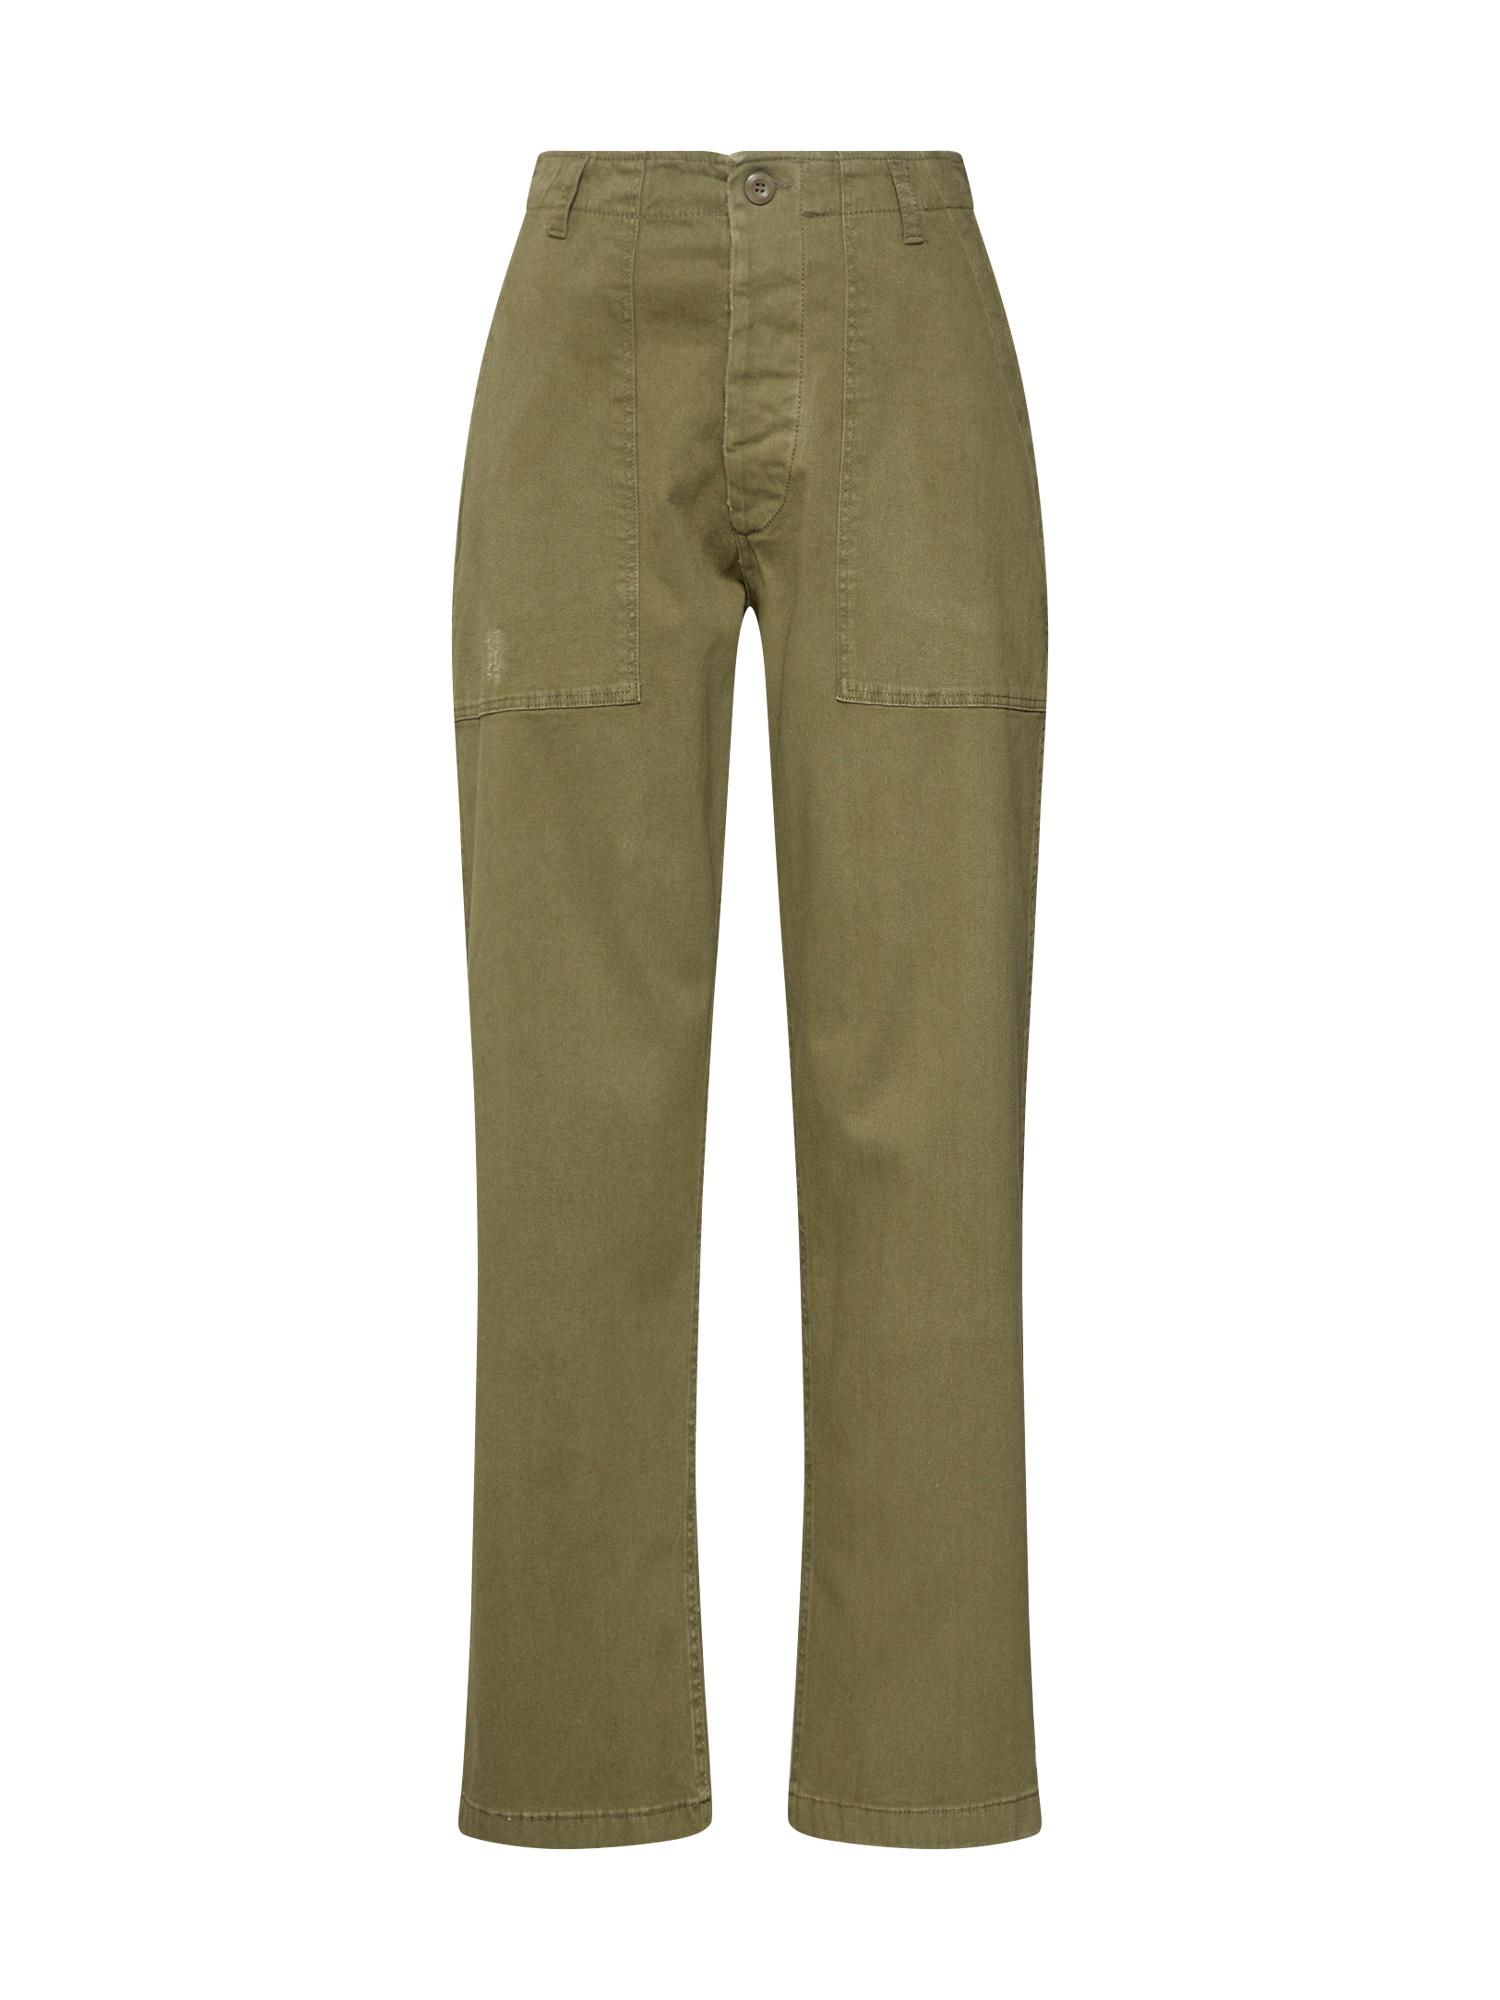 Kalhoty Surplus khaki Ragdoll LA